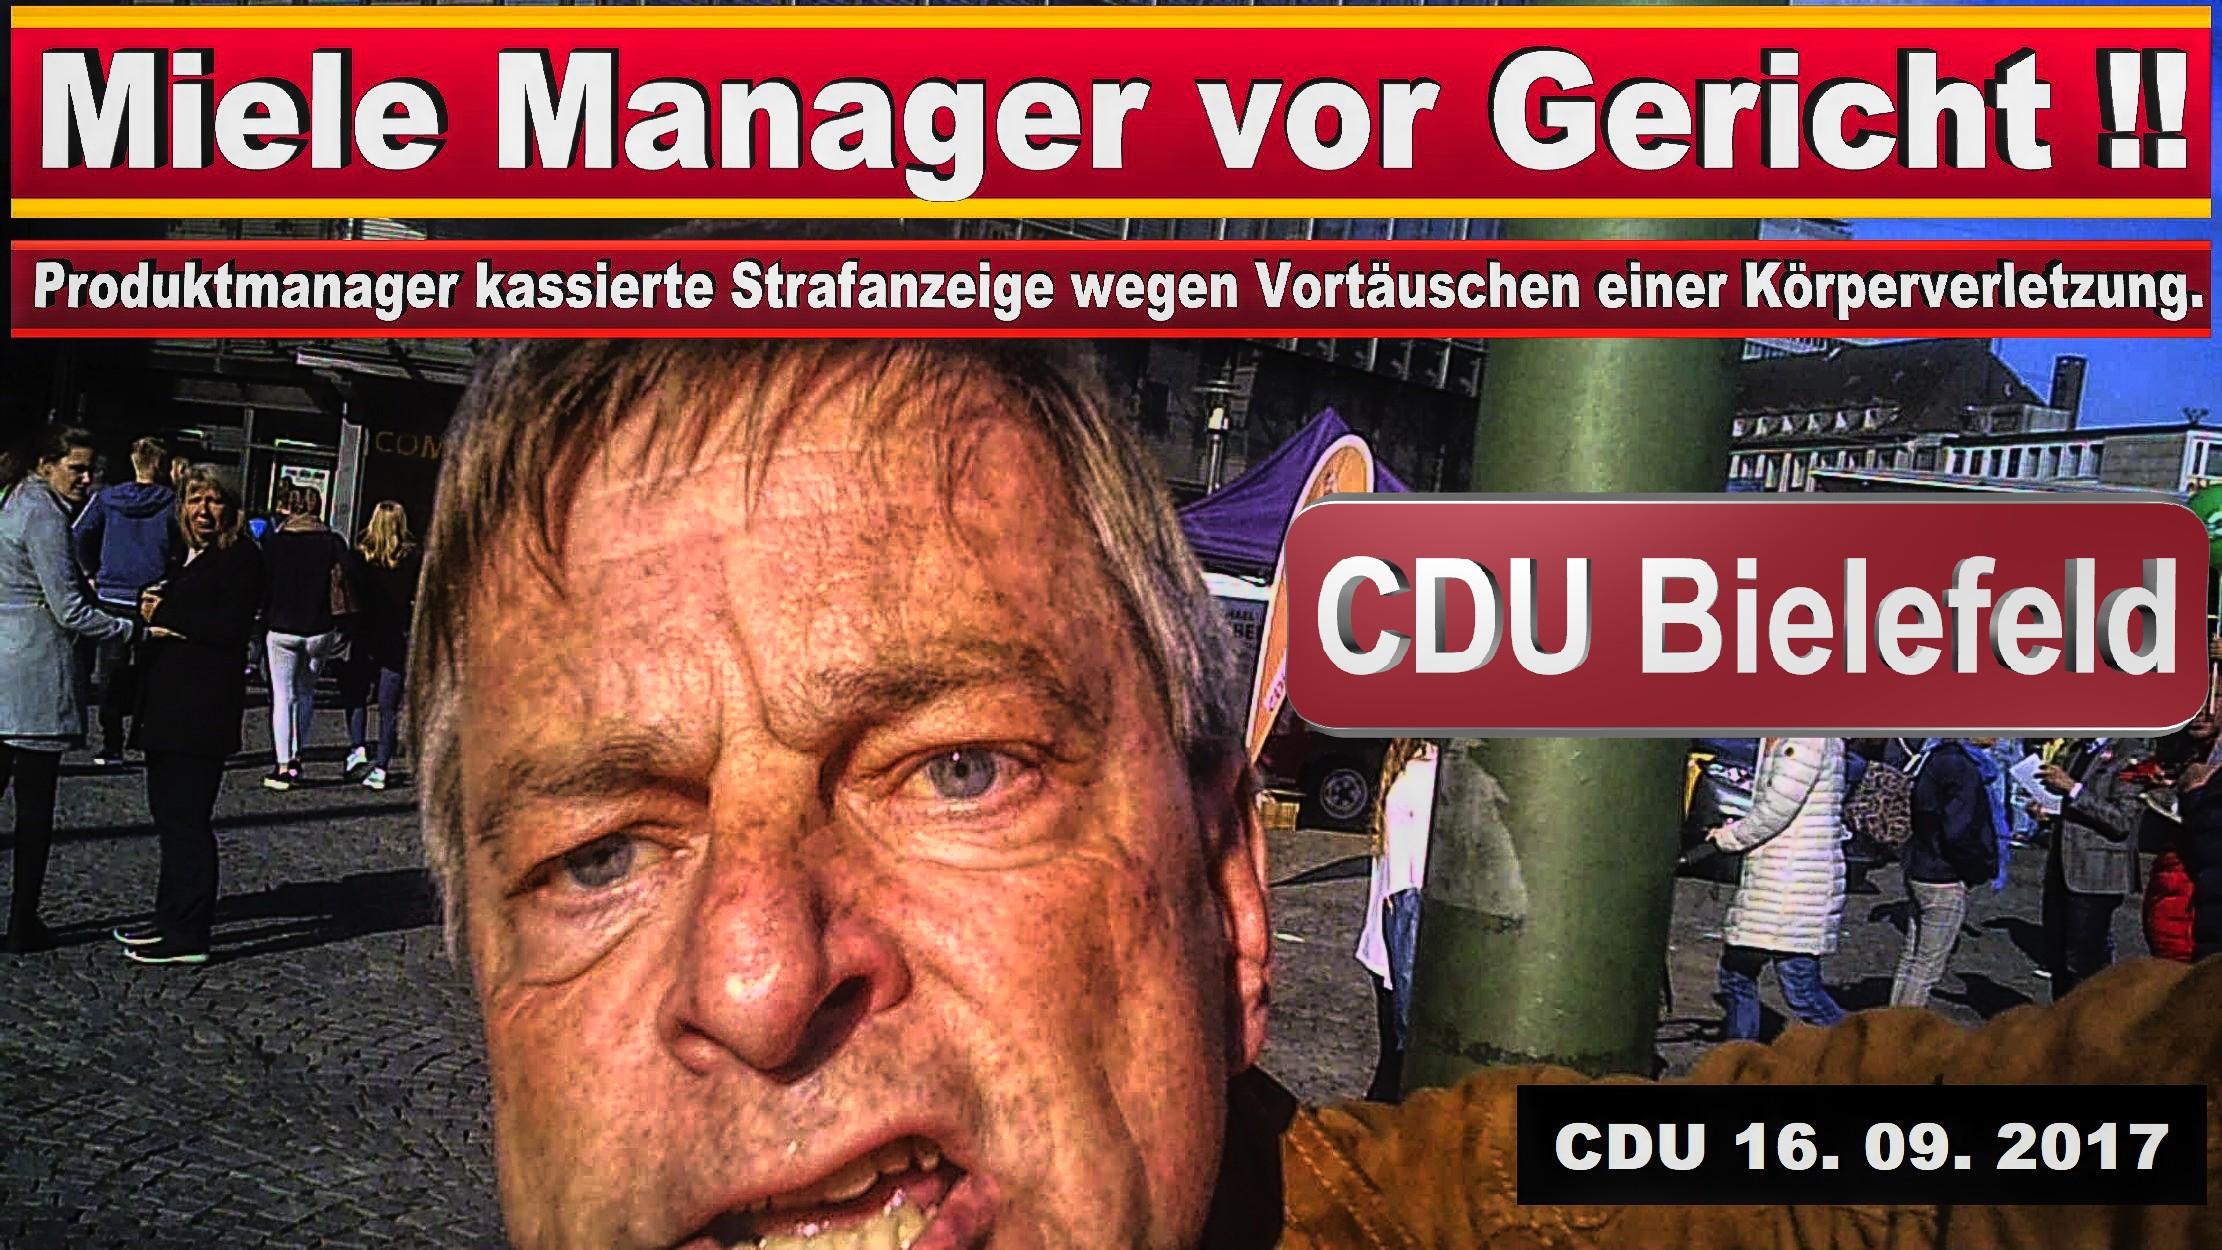 CDU BIELEFELD SENNE MICHAEL WEBER MIELE GüTERSLOH PRODUKTMANAGER JURIST SPD FDP AFD BIELEFELD